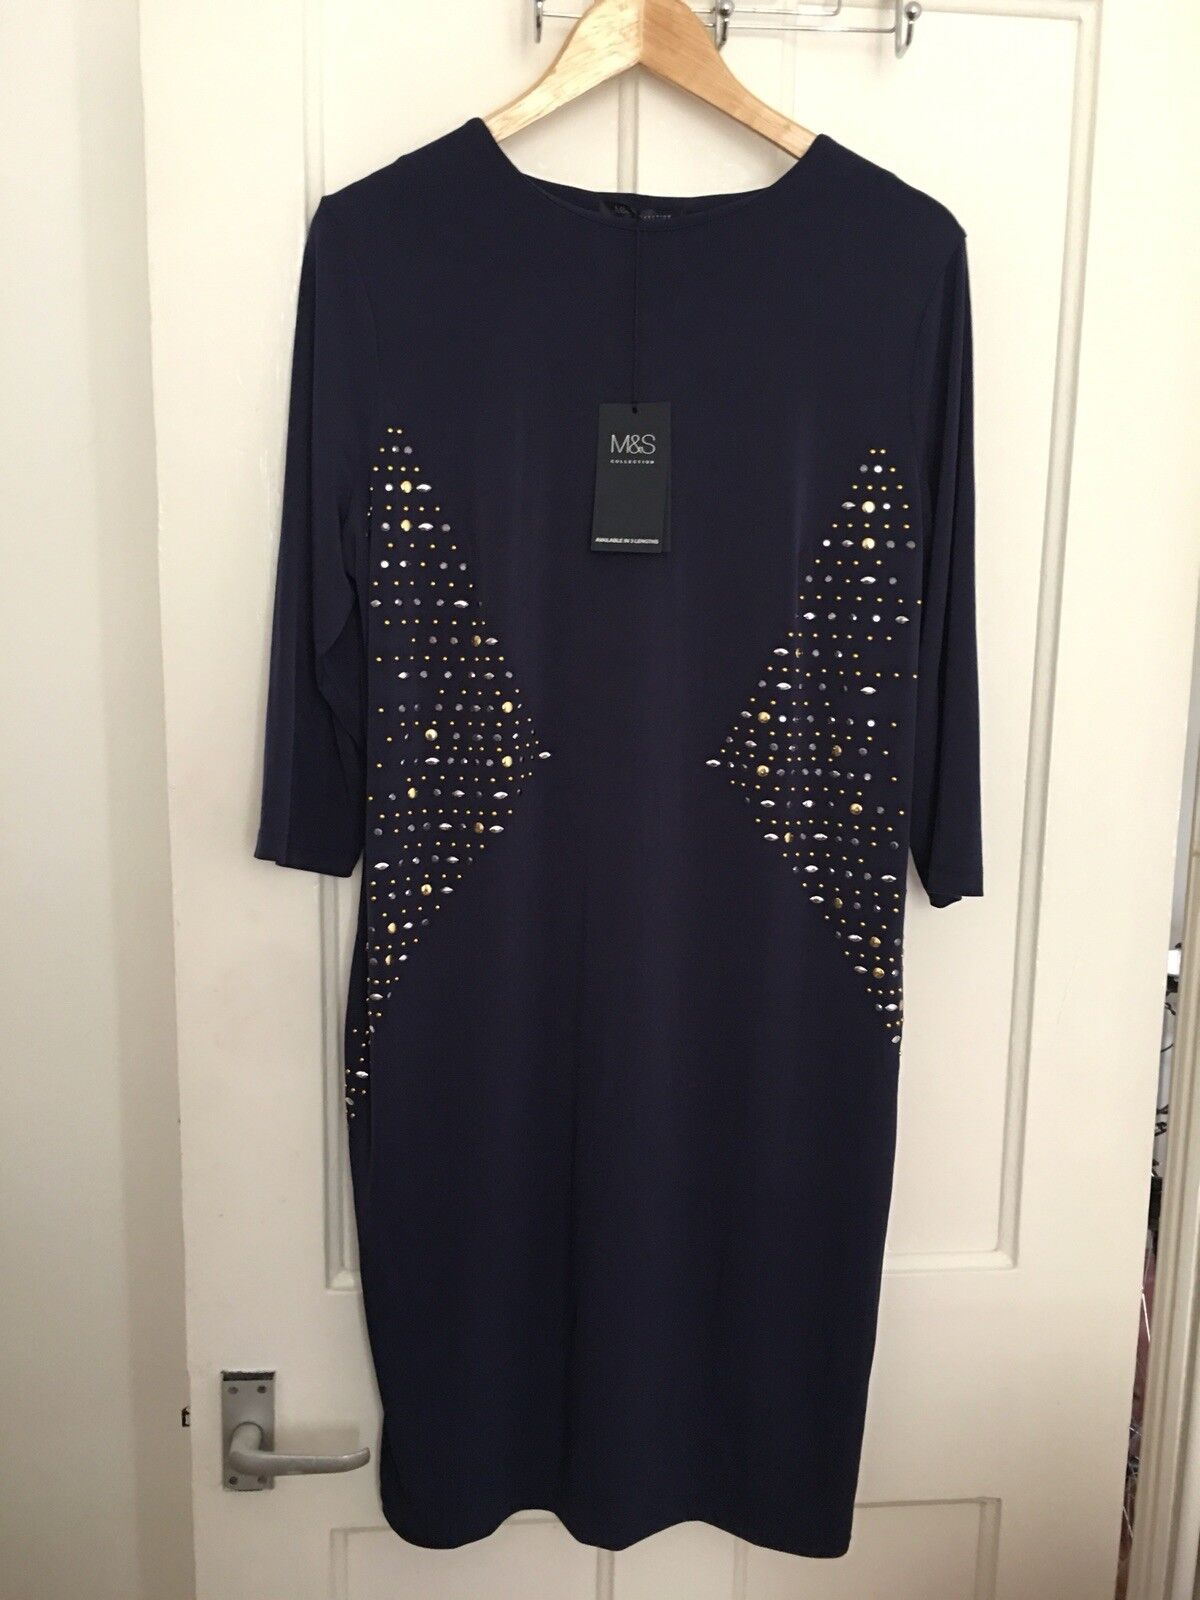 BNWT Size 18 Short Marks and Spencer bluee Stretch Embellished Dress (12)